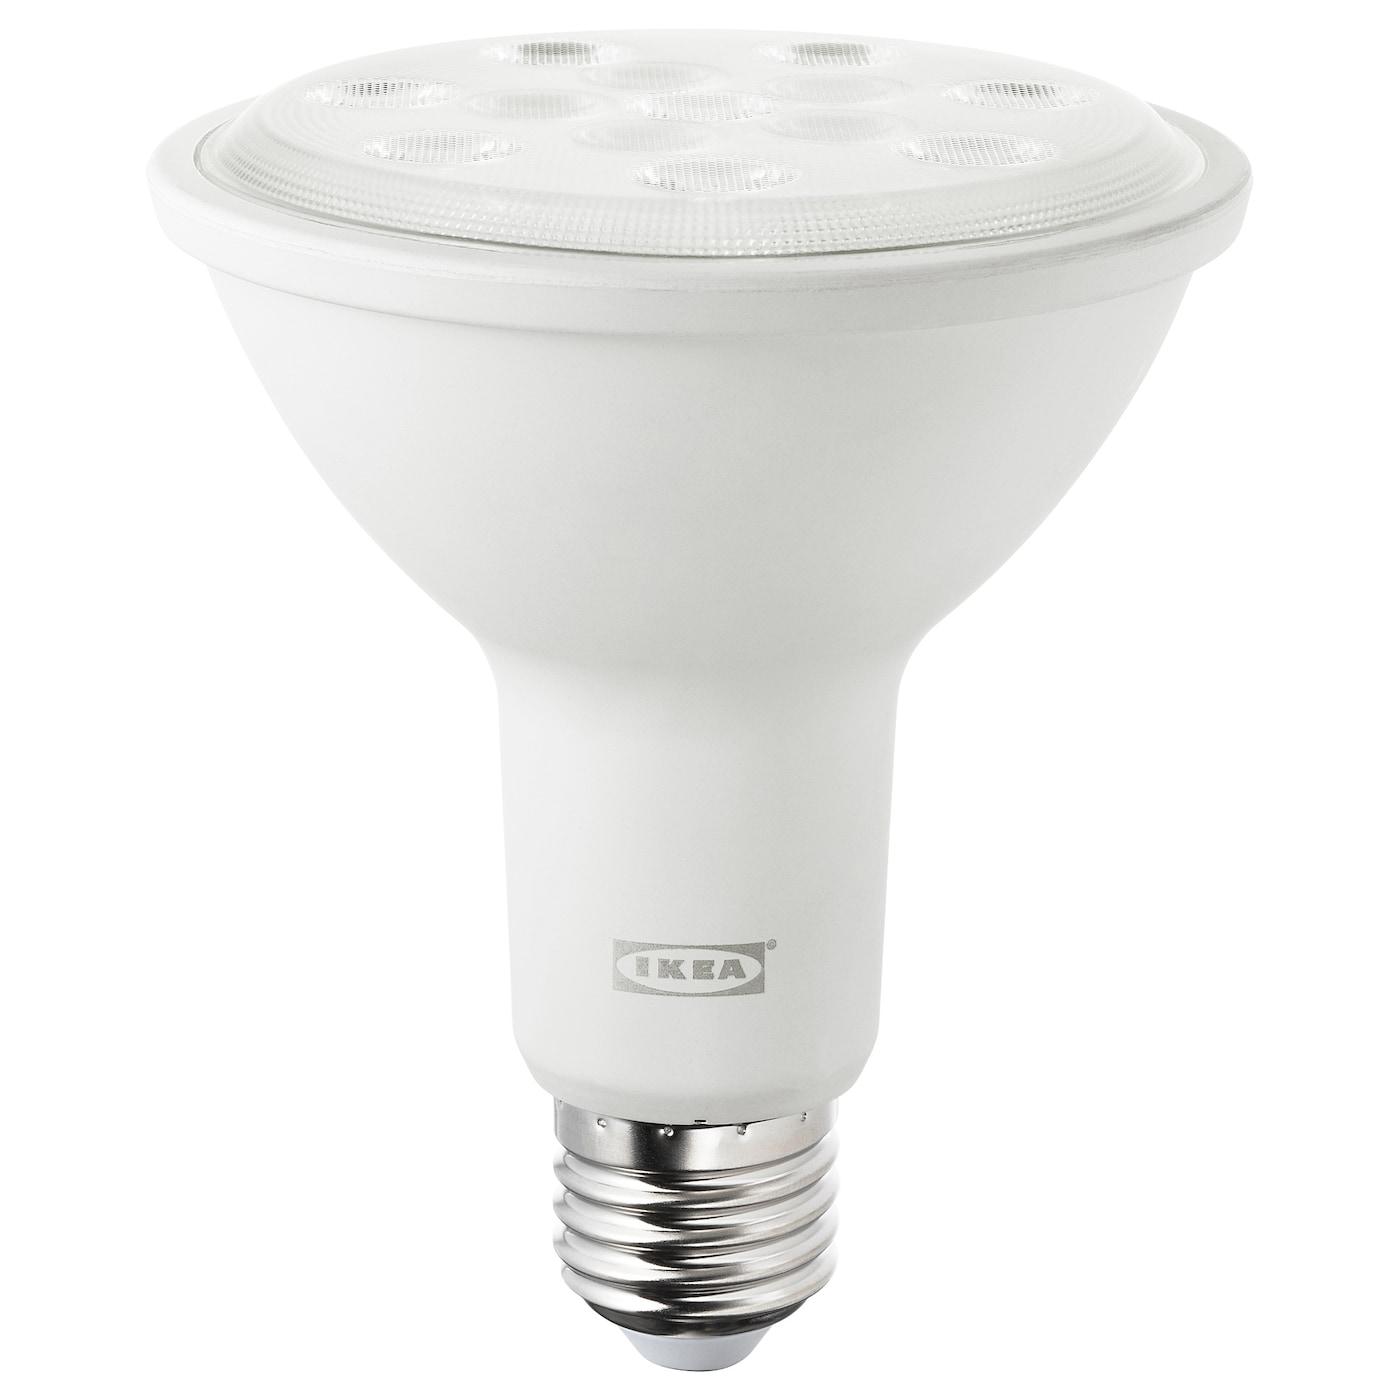 Växtlampa Odla LED 16W E27 Wattväktarna